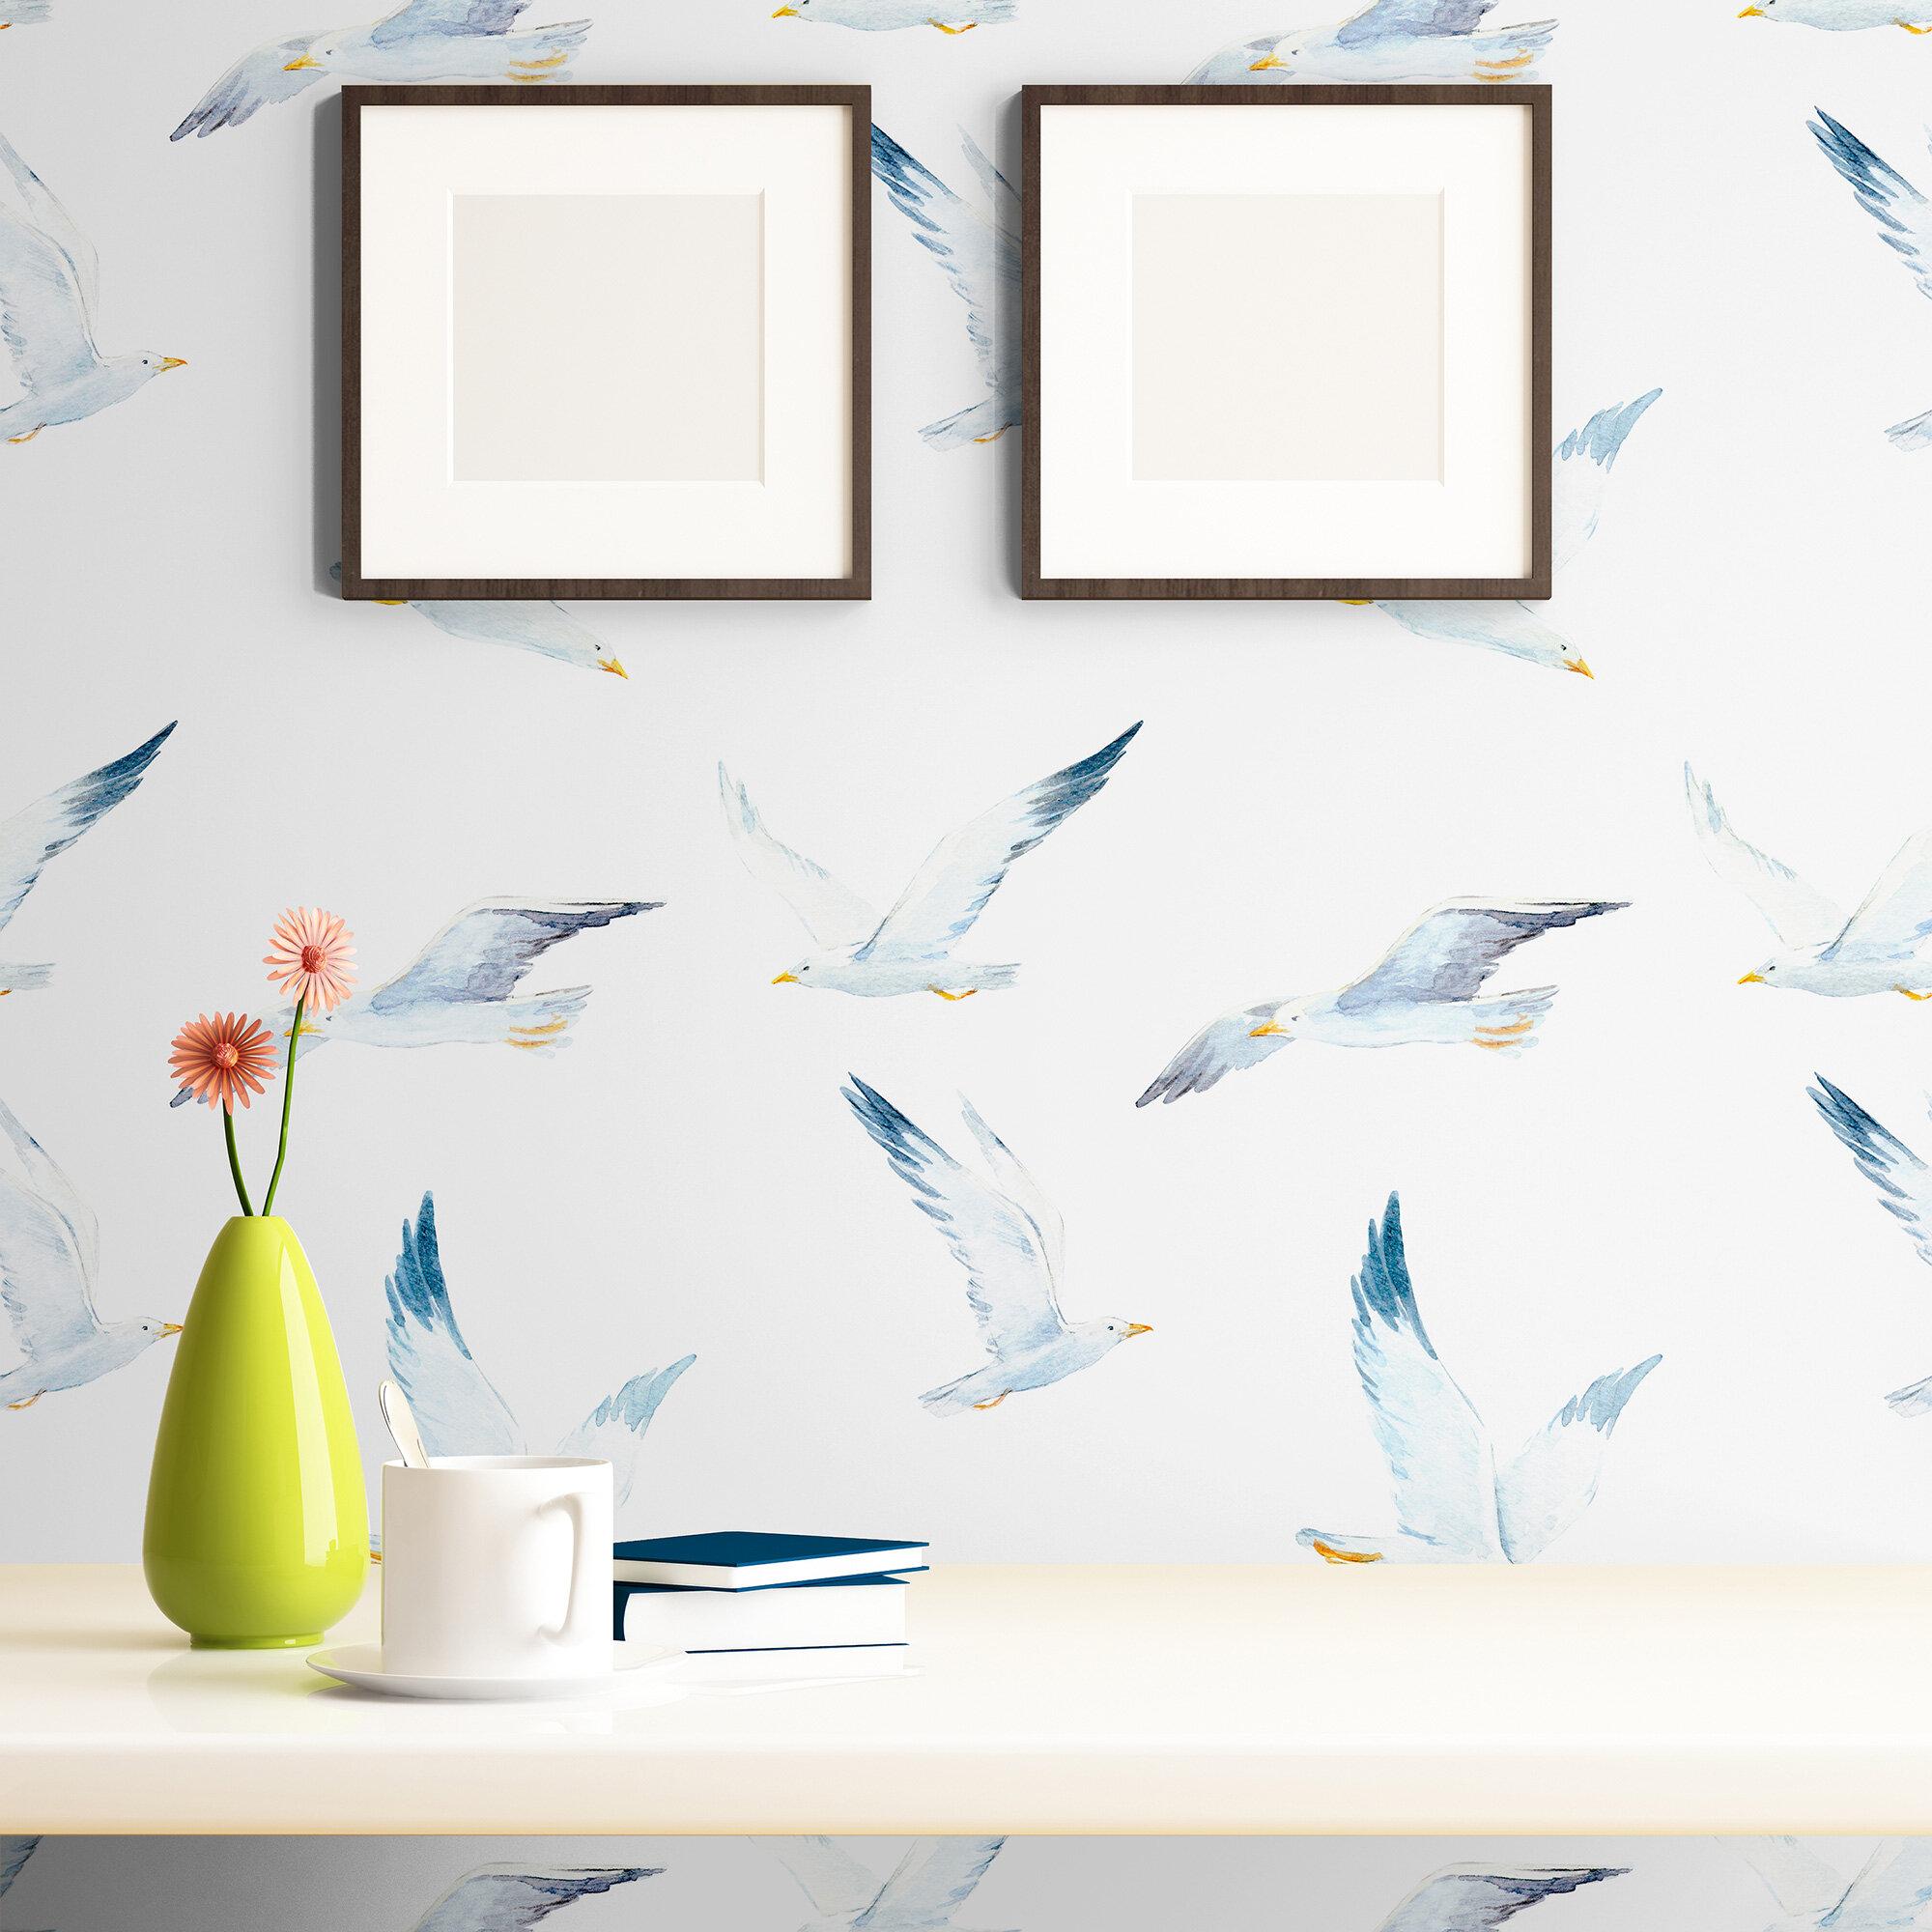 ridge bird nautical removable peel and stick wallpaper panel